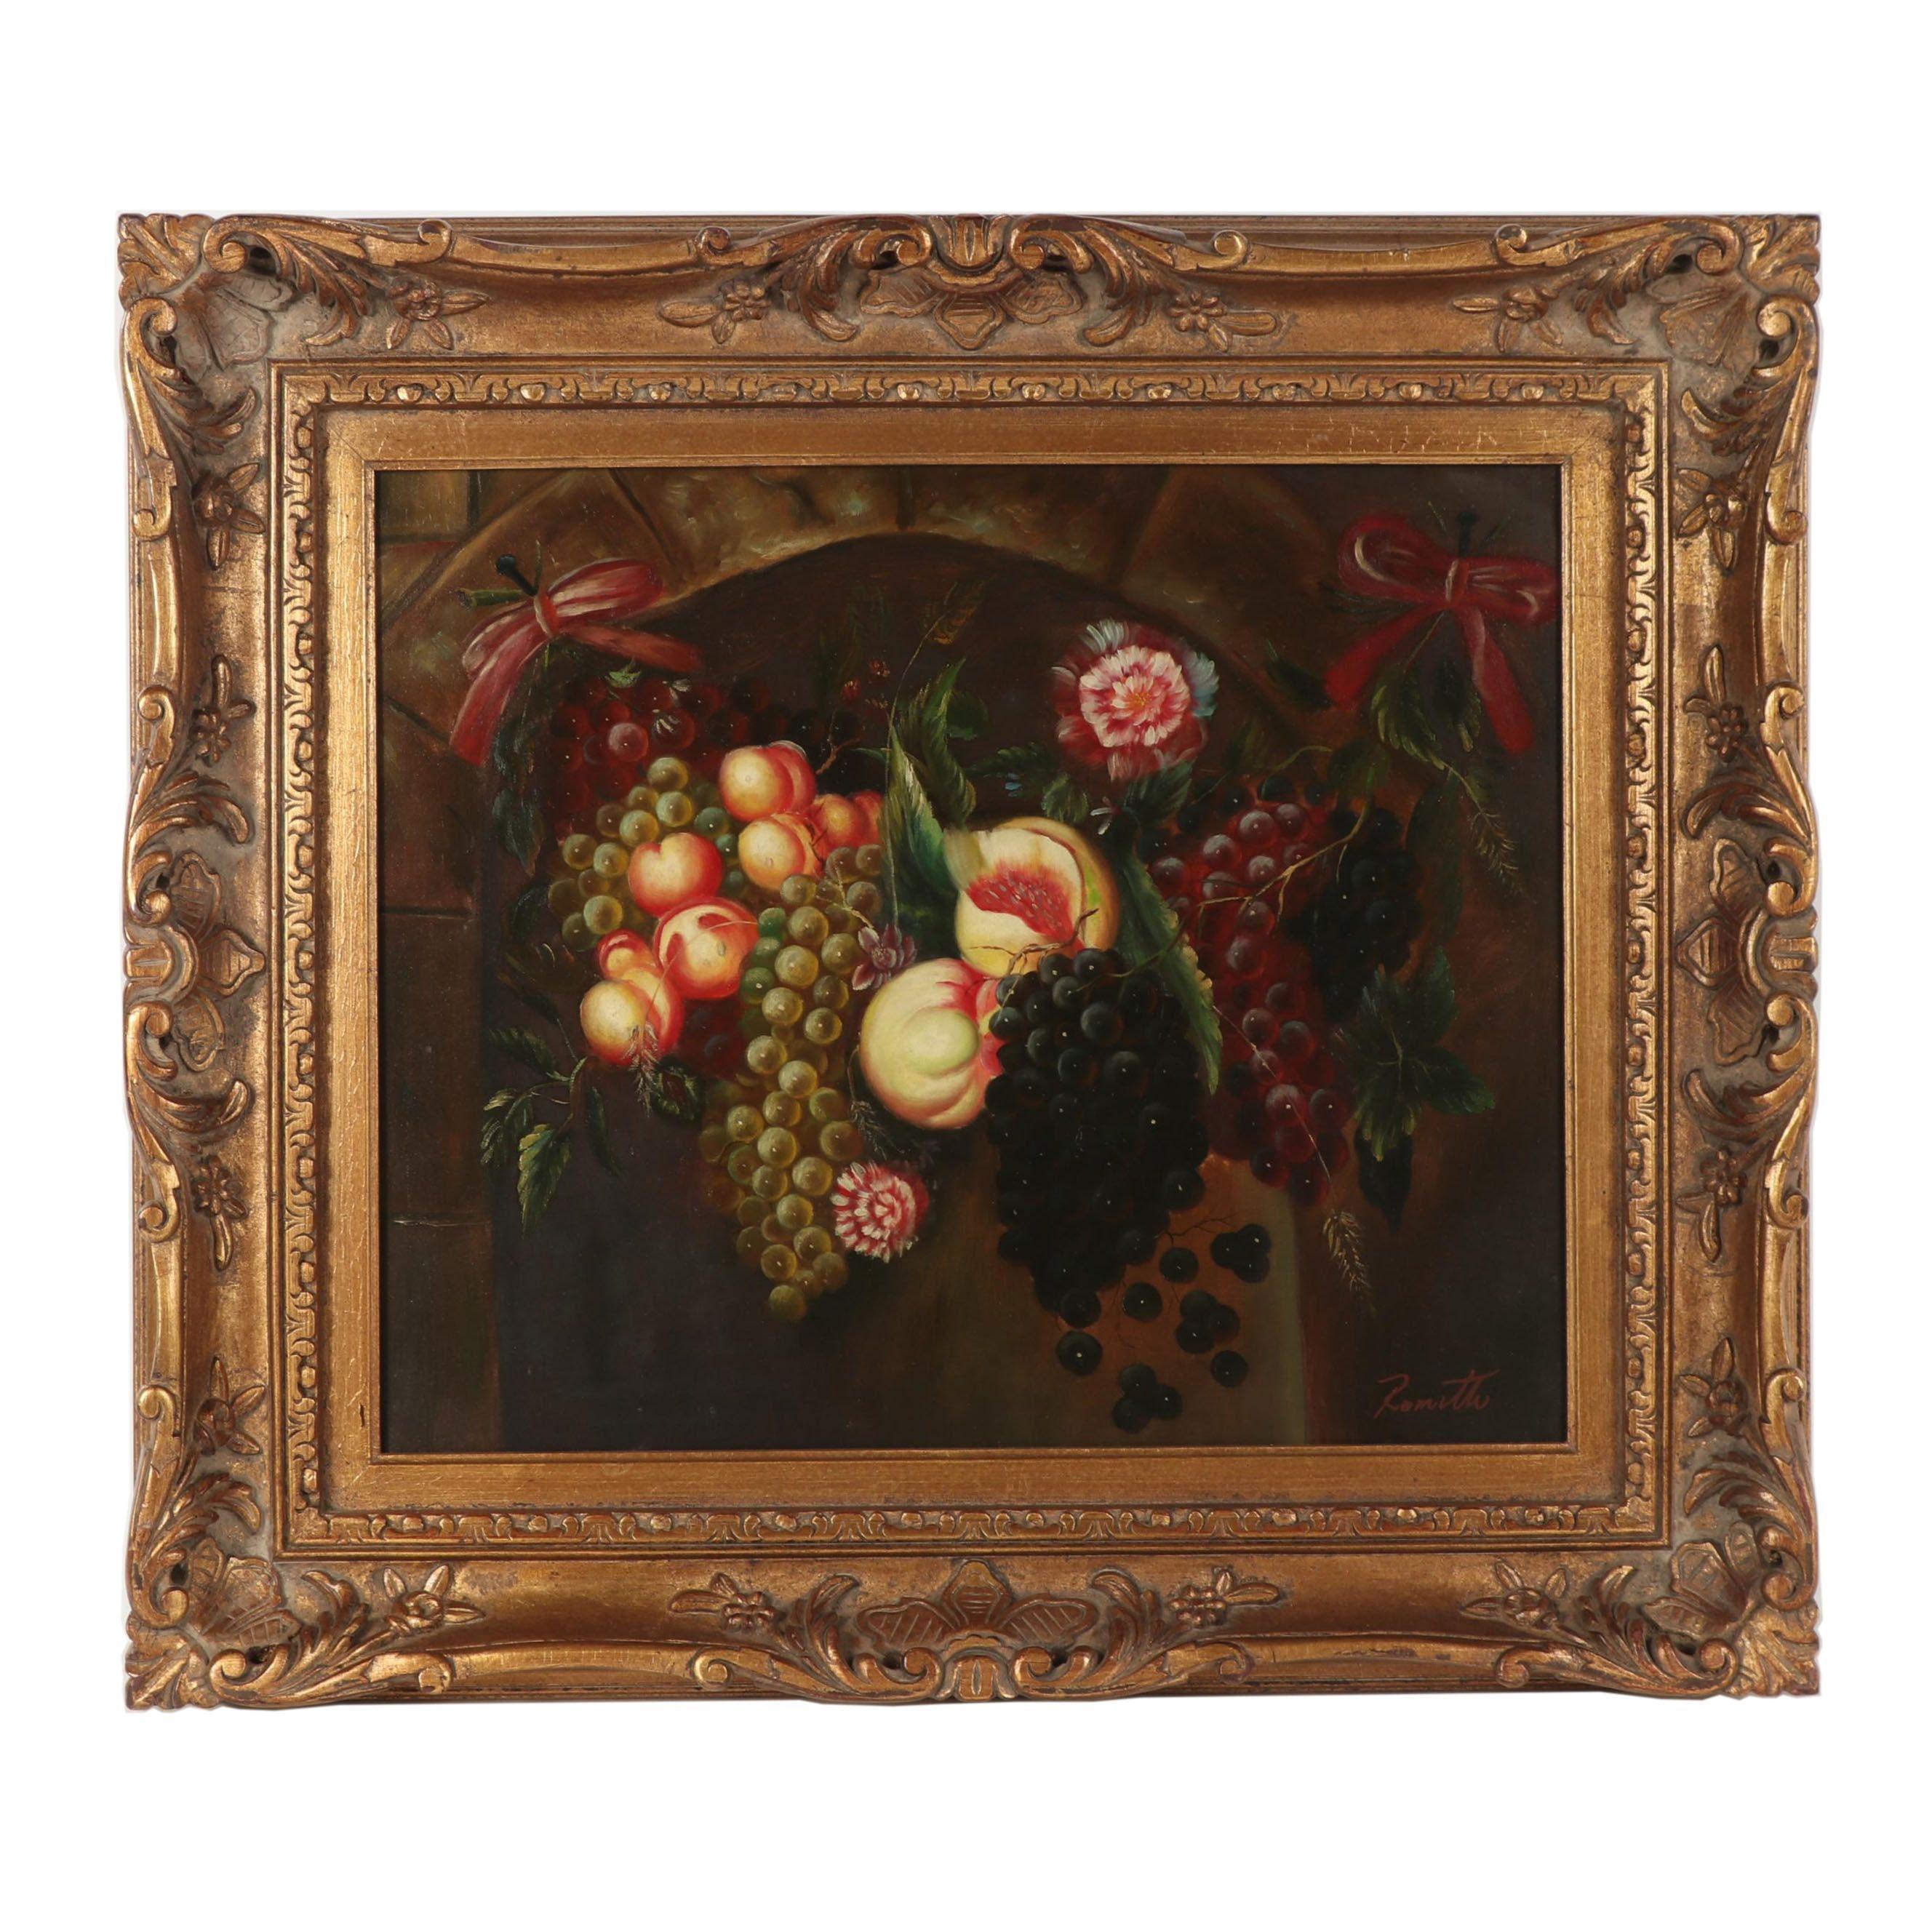 Romith Fruit Still Life Oil Painting